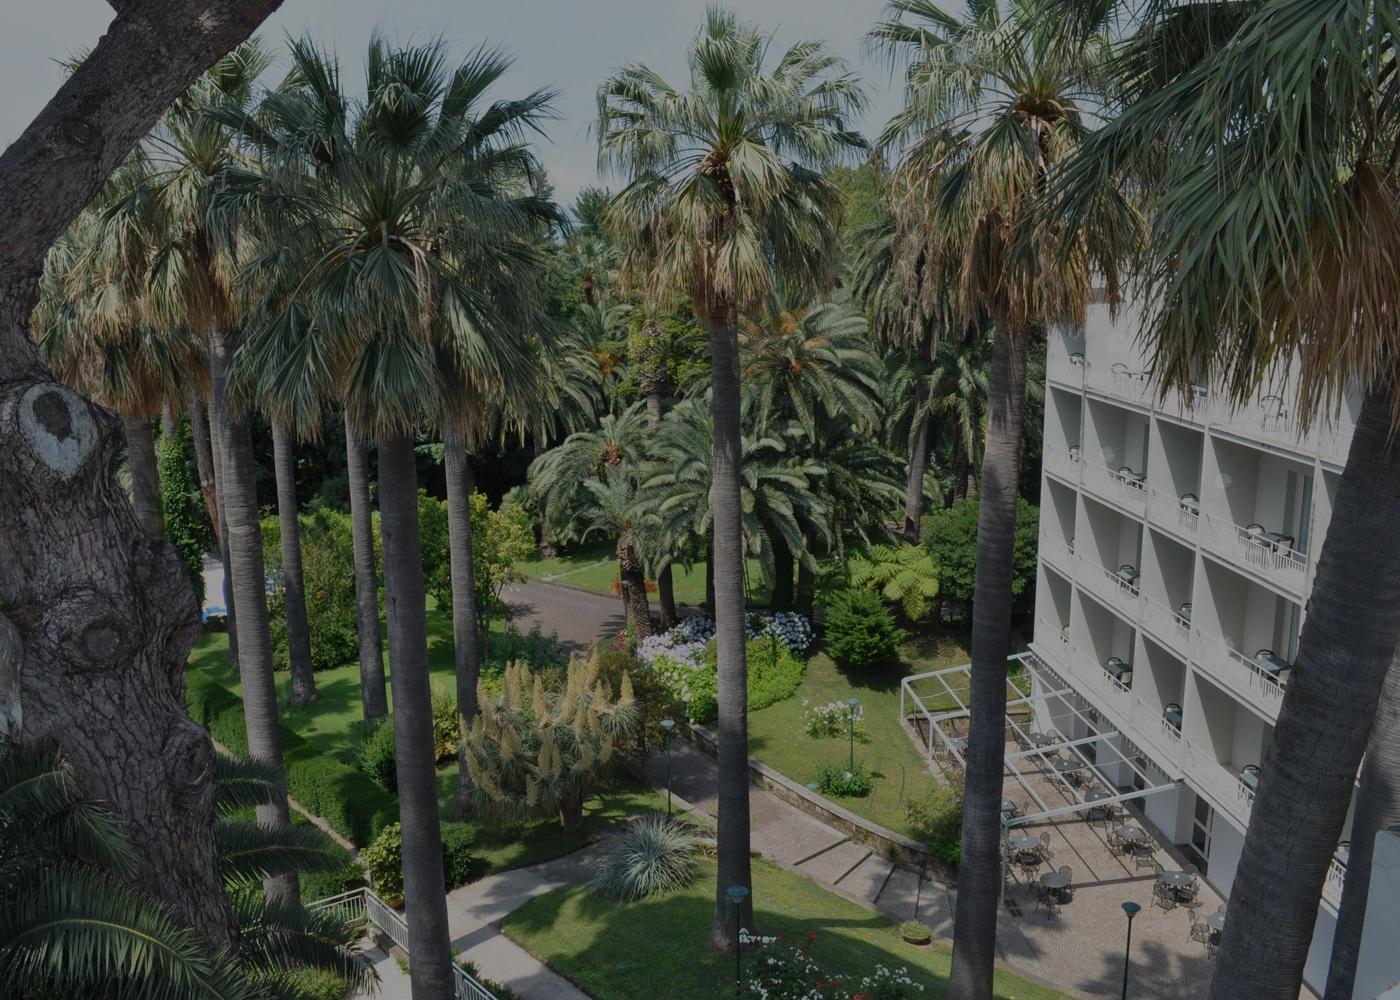 Hotel 4 stelle a Sorrento con un grande parco botanico.